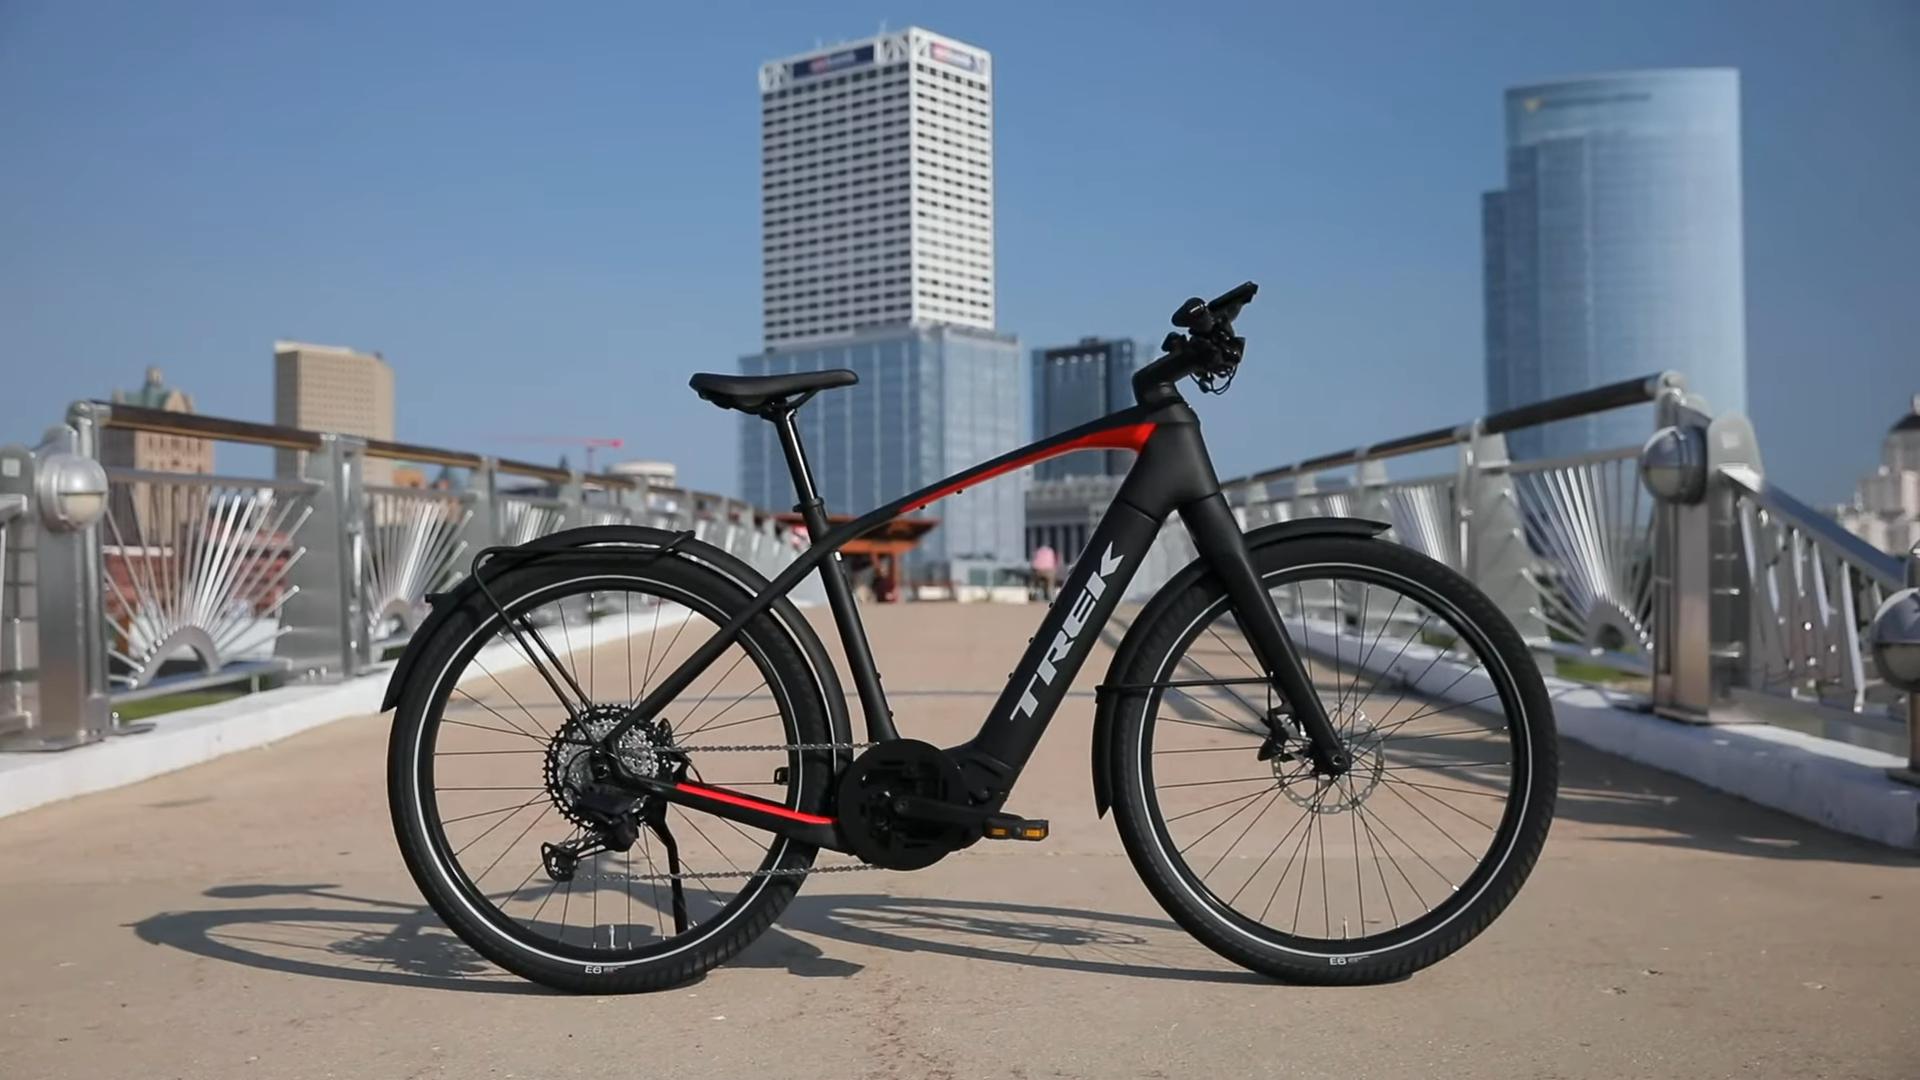 Trek Allant+ 9.9S e-bike model review